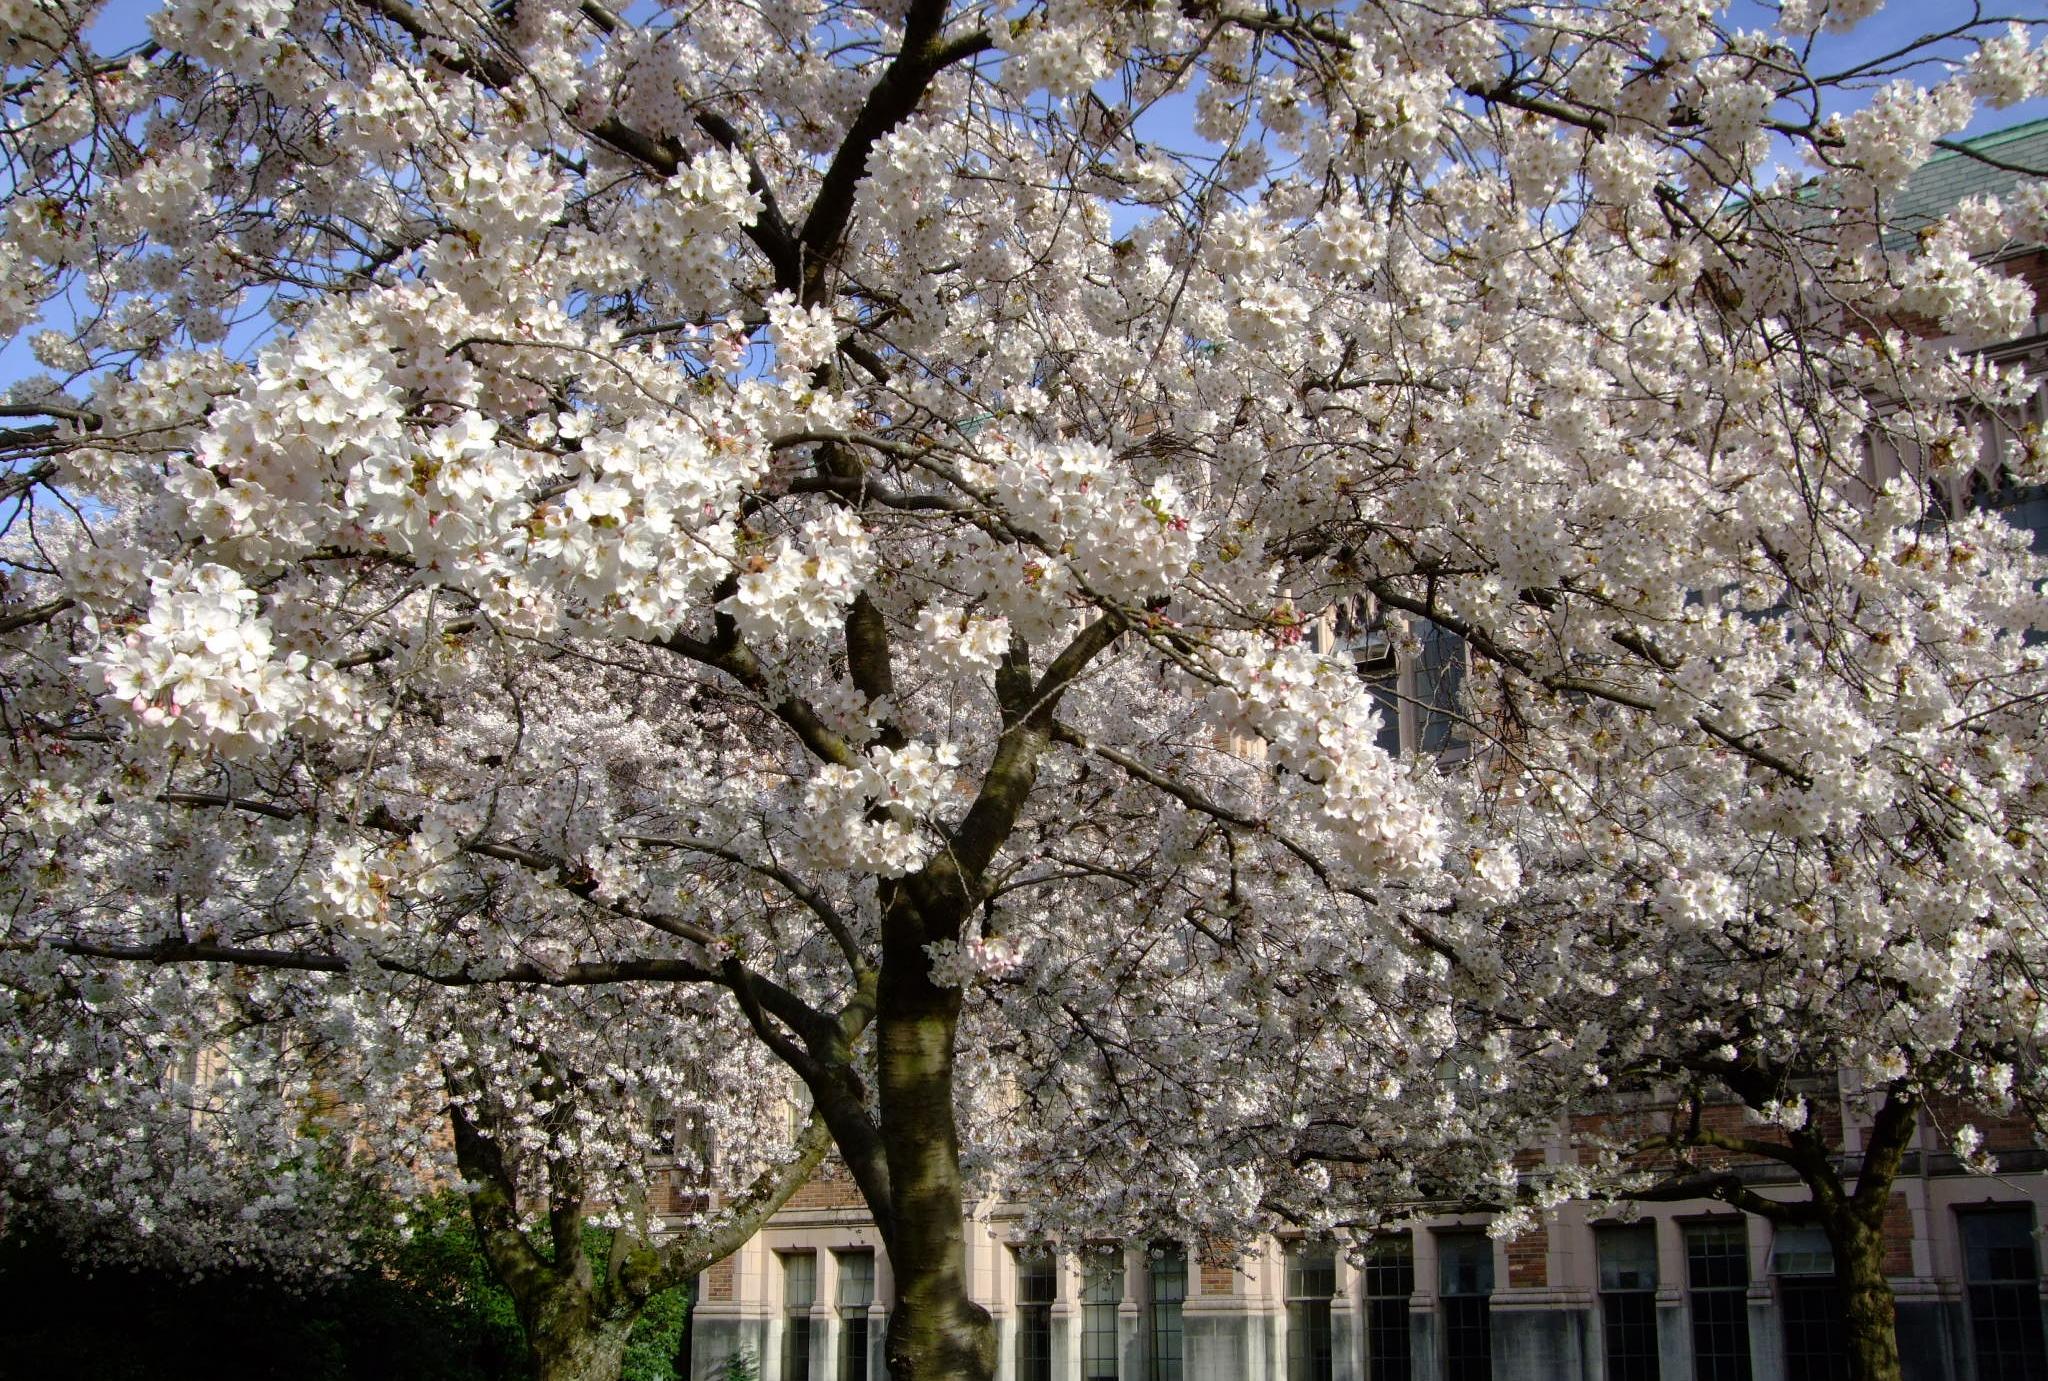 Cherry blossoms at UW, April 2013